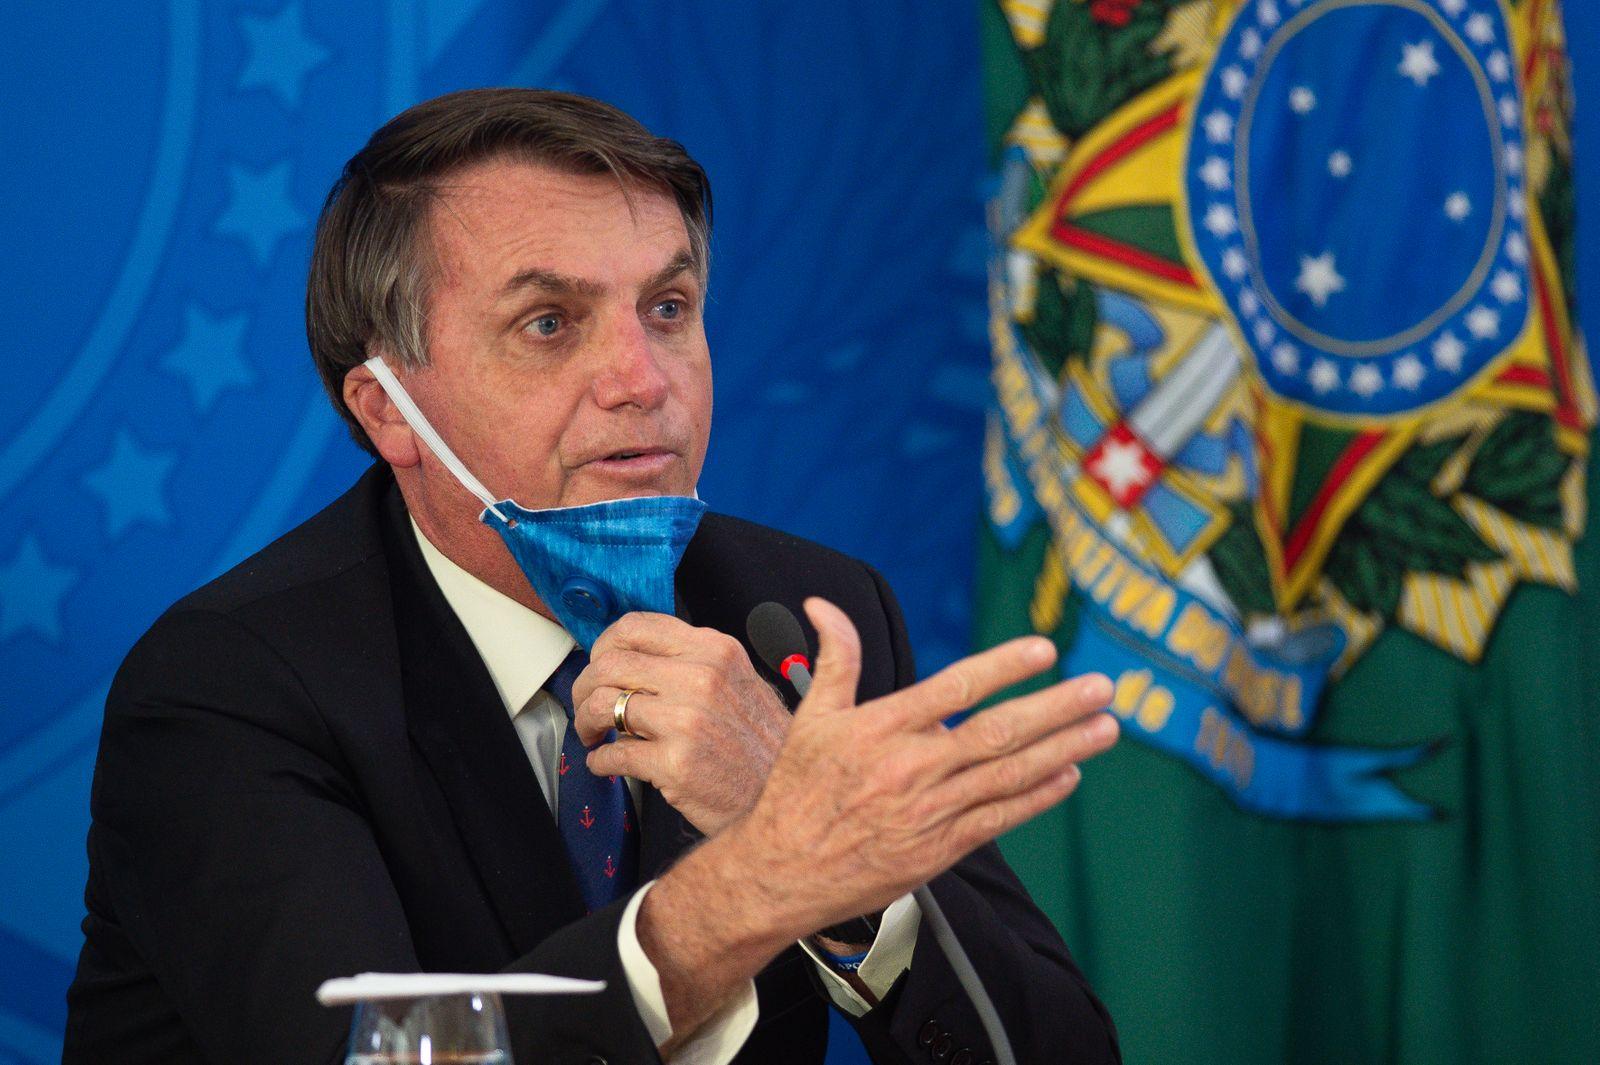 Jair Bolsonaro / Brasilien / Coronavirus